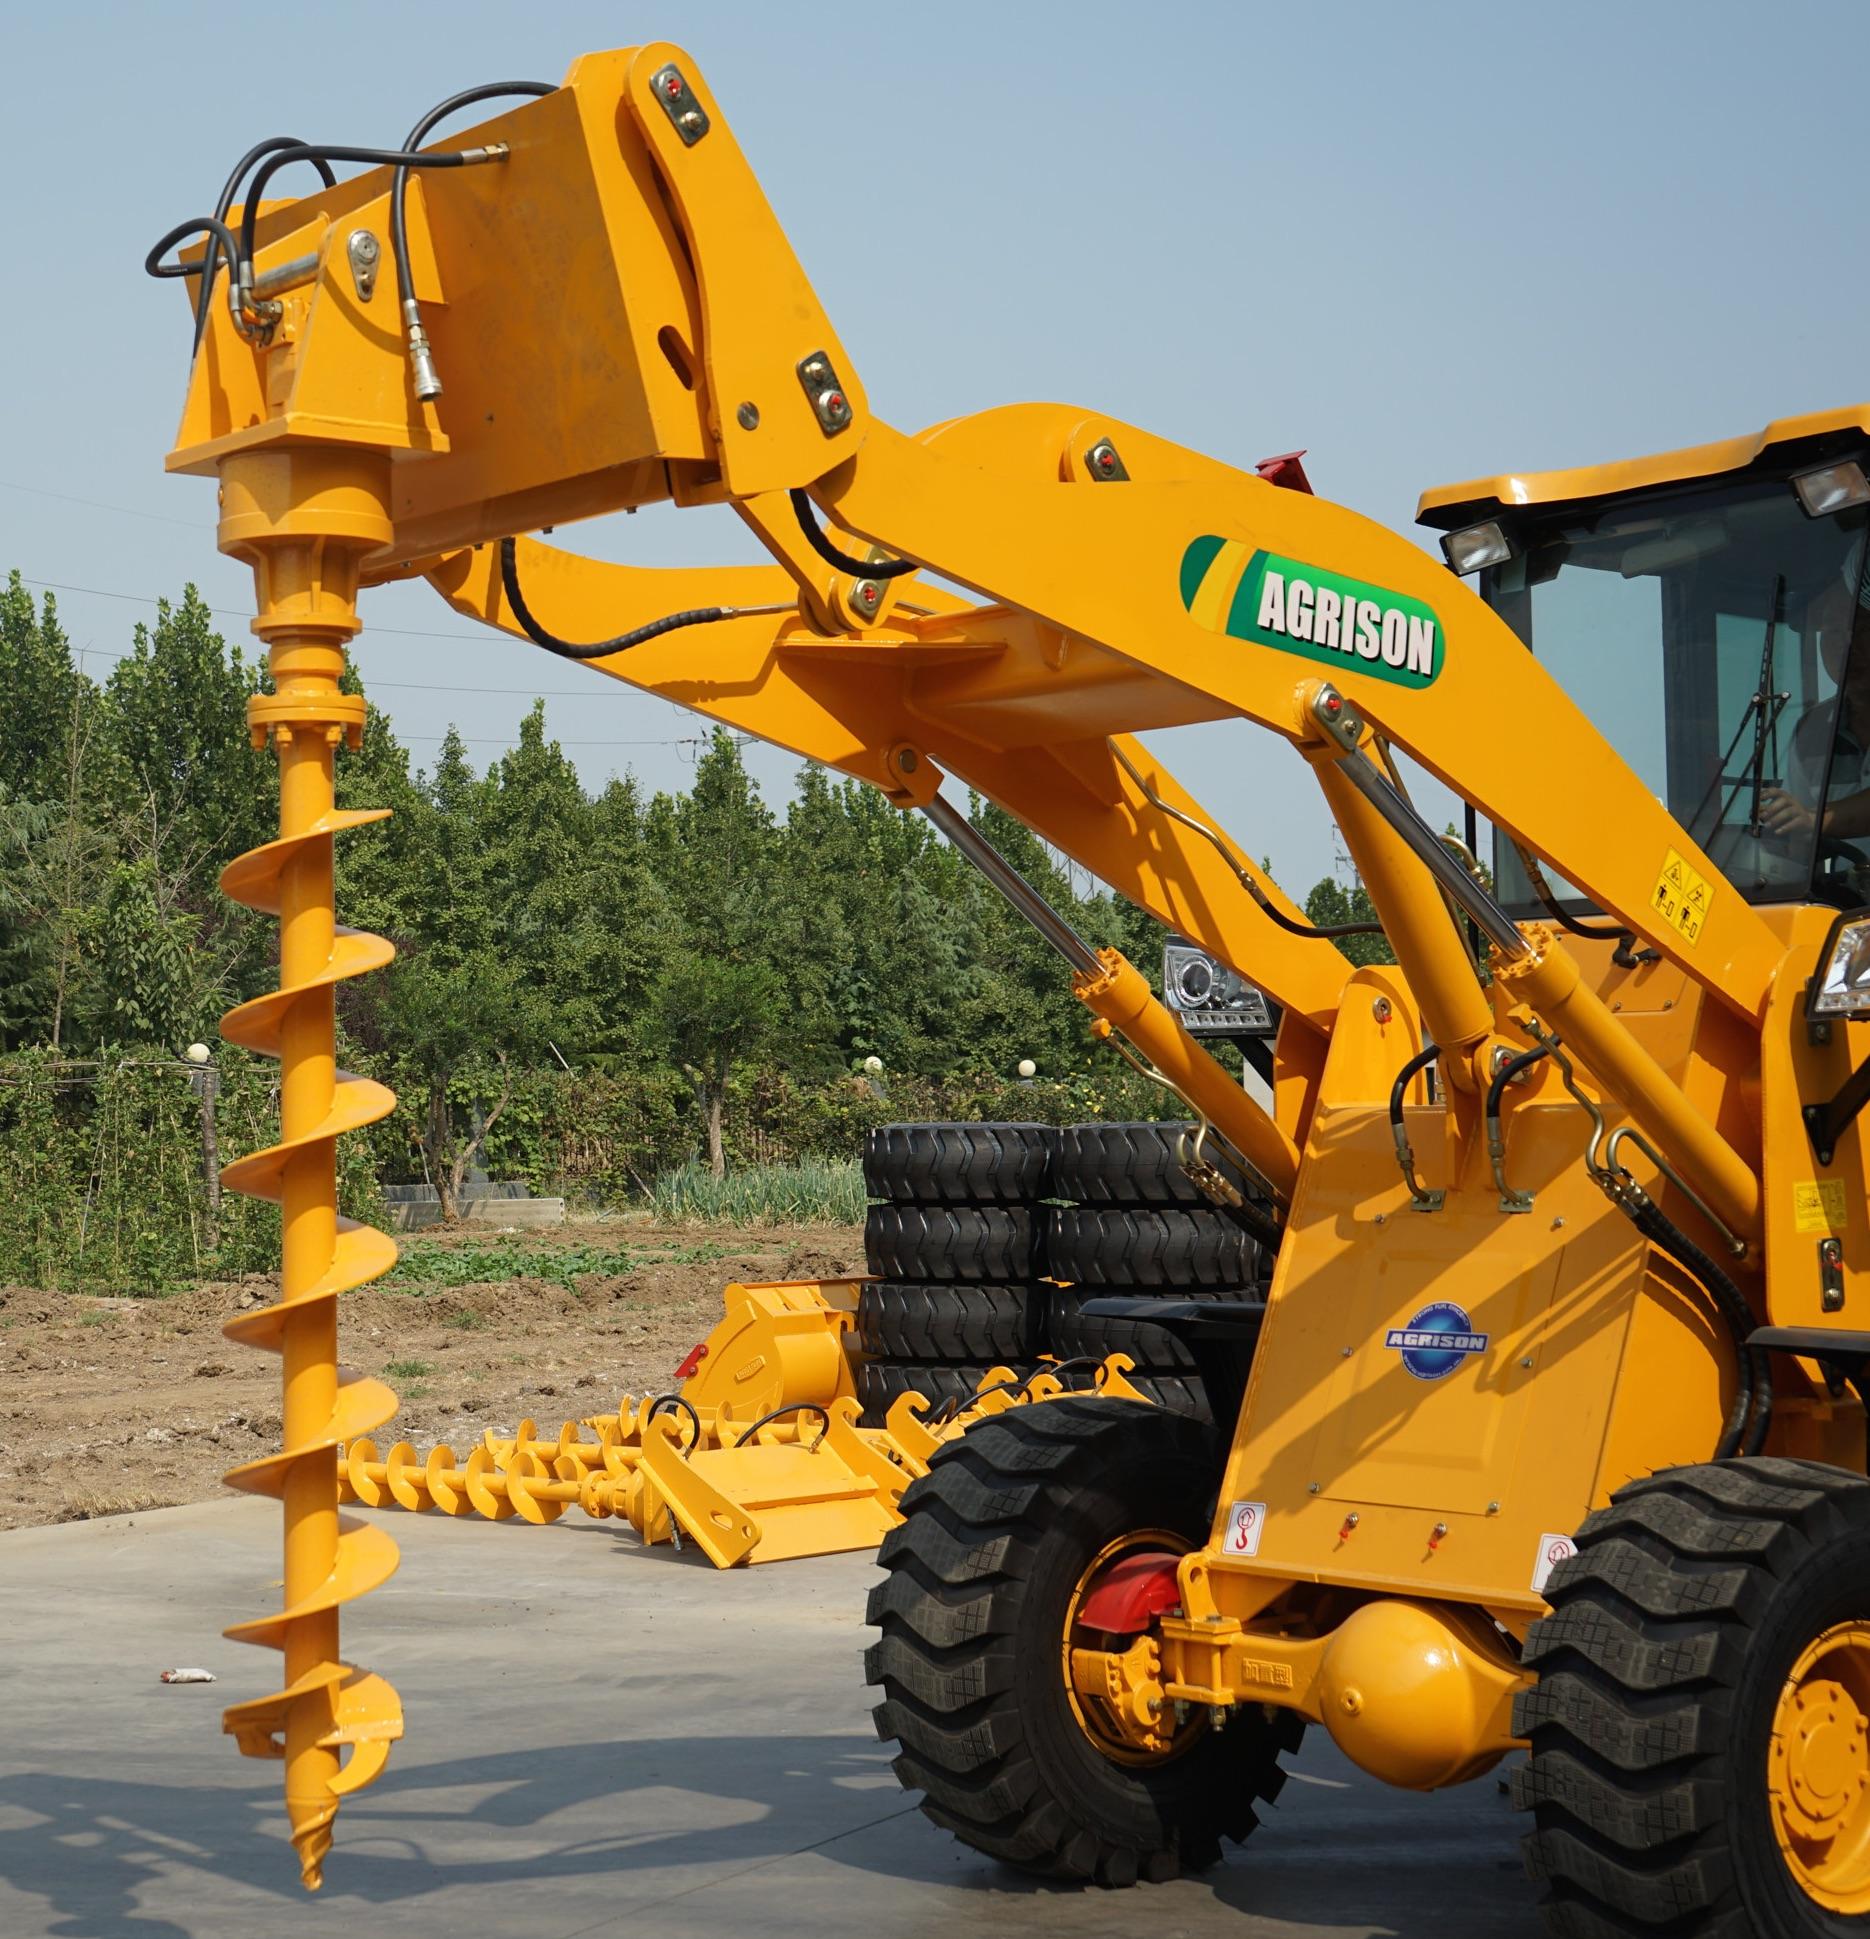 macchine agricole agrison australia Agrison-Wheel-Loader-TX-Post-Hole-Digger